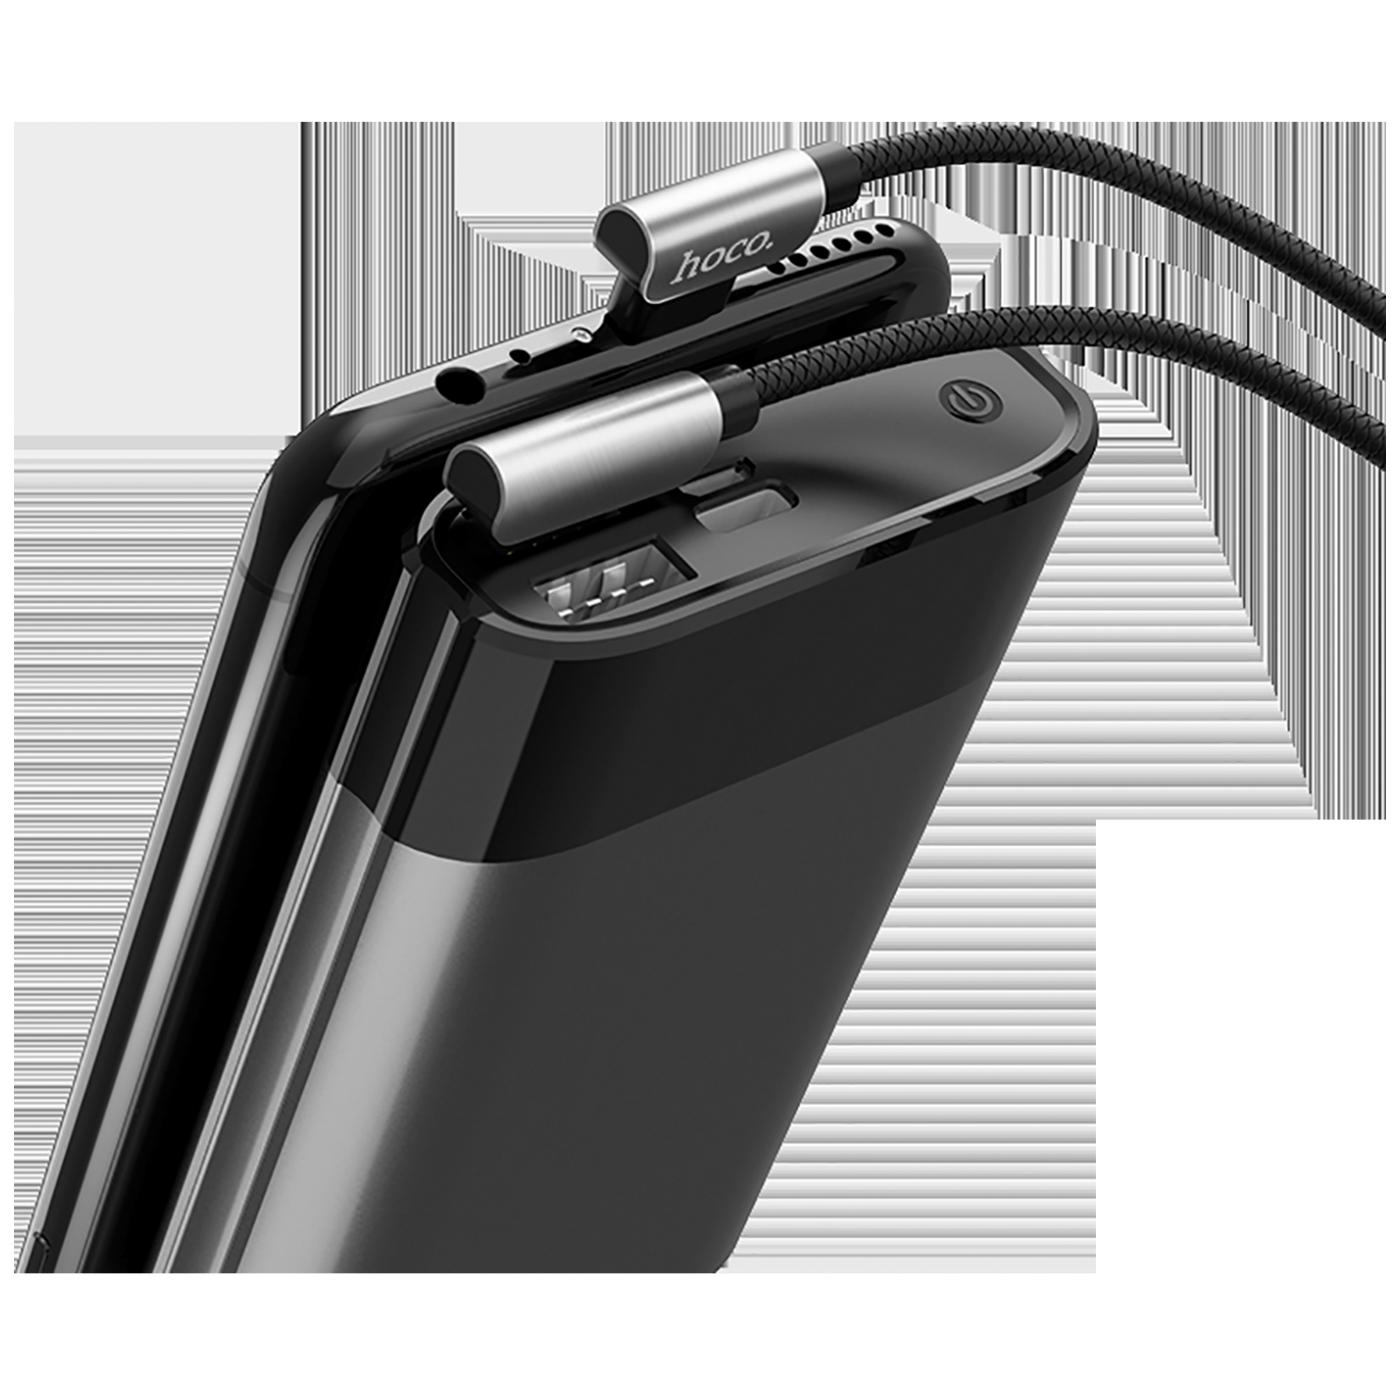 U42 Exquisite steel, Micro USB, BK